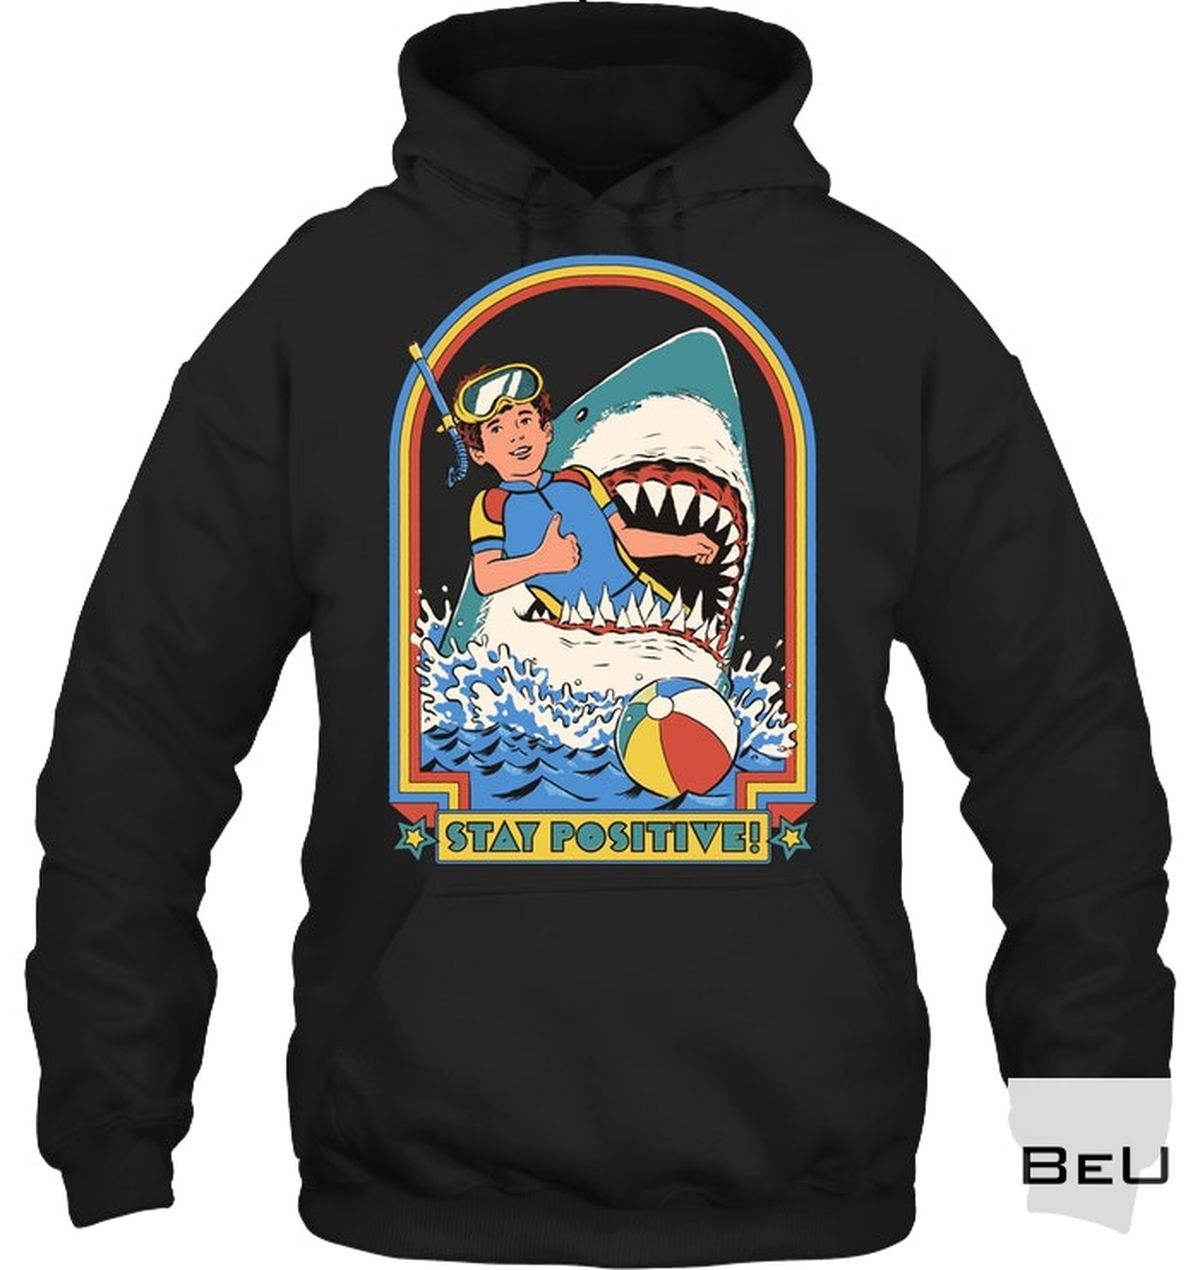 Stay Positive Shark Shirt a